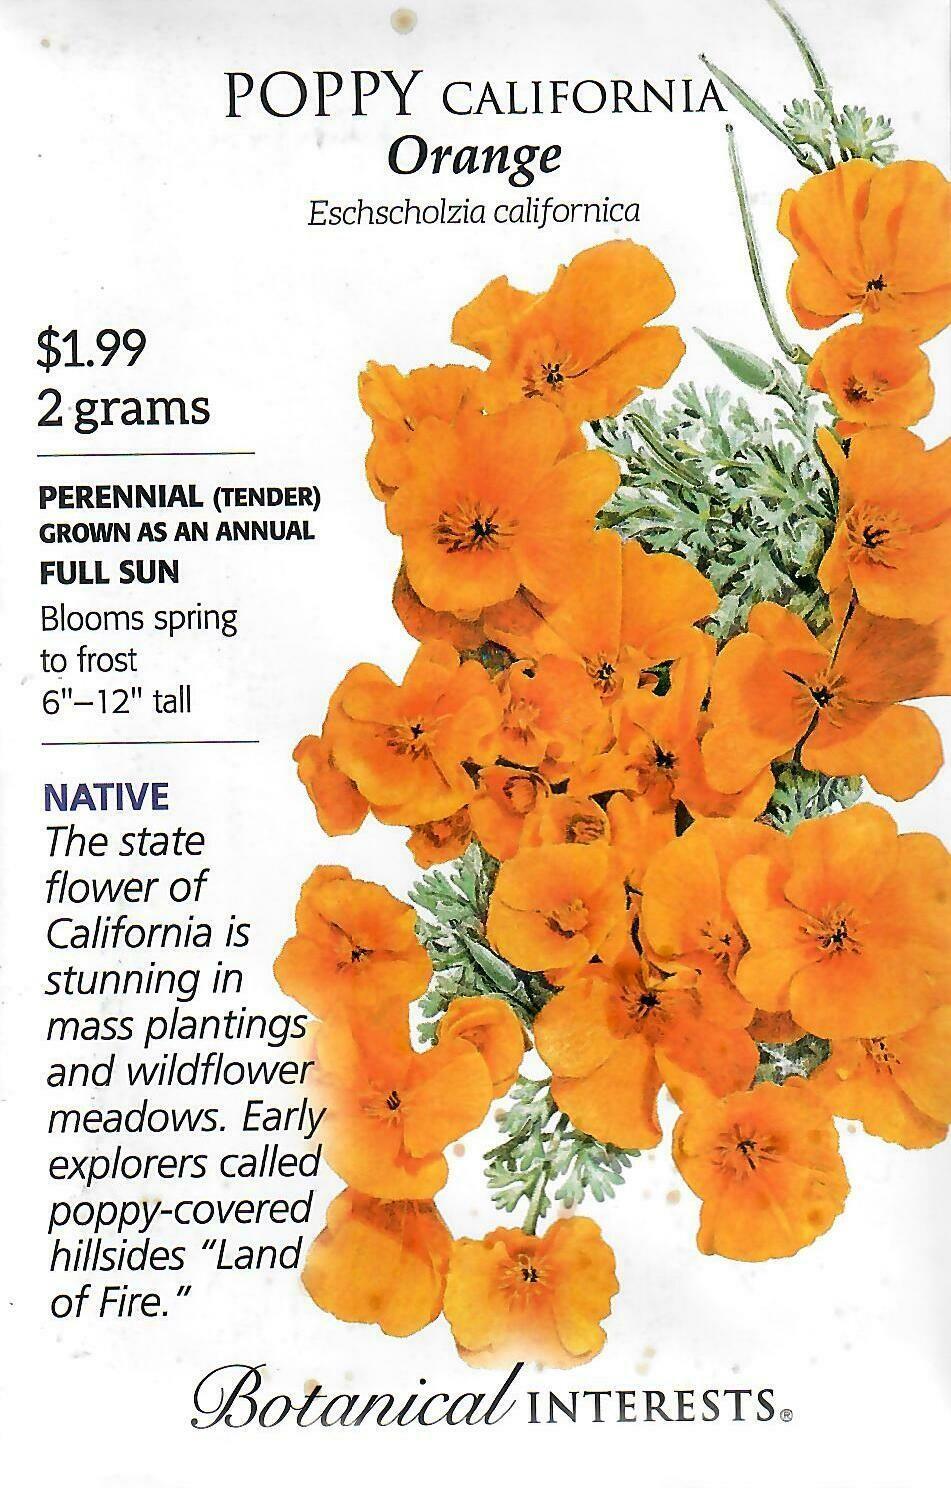 Poppy California Orange Org Botanical Interests